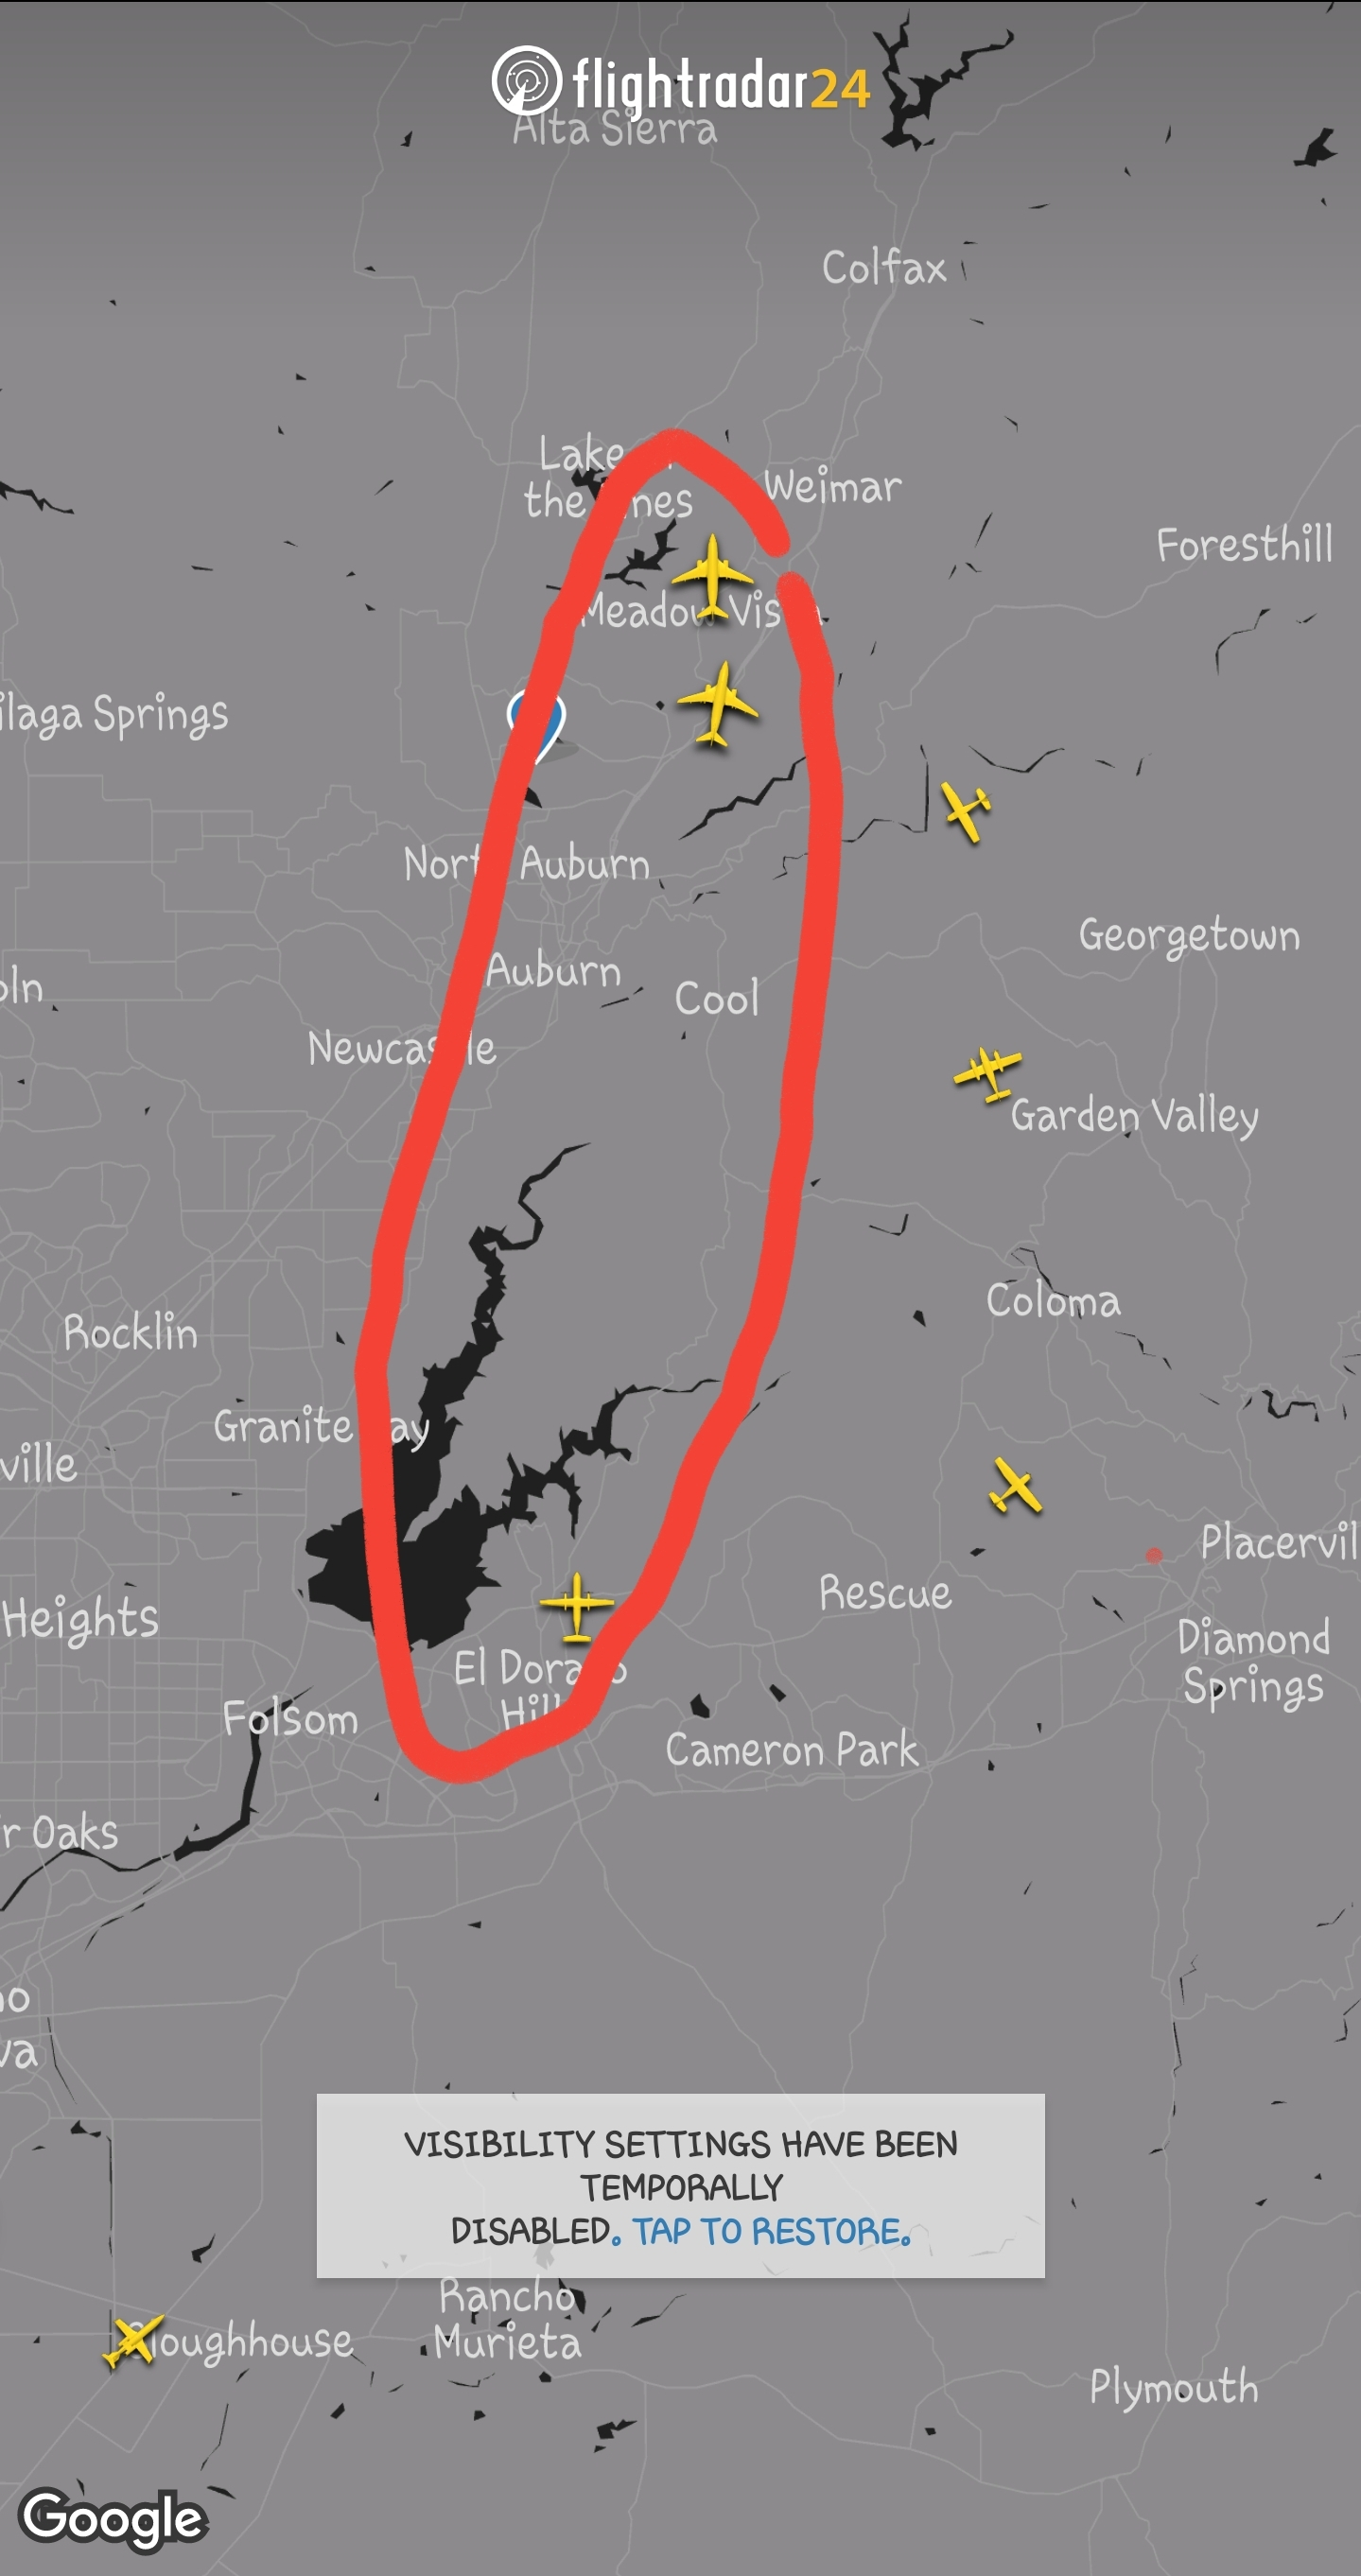 Screenshot_20210621-000515_Flightradar24.jpg